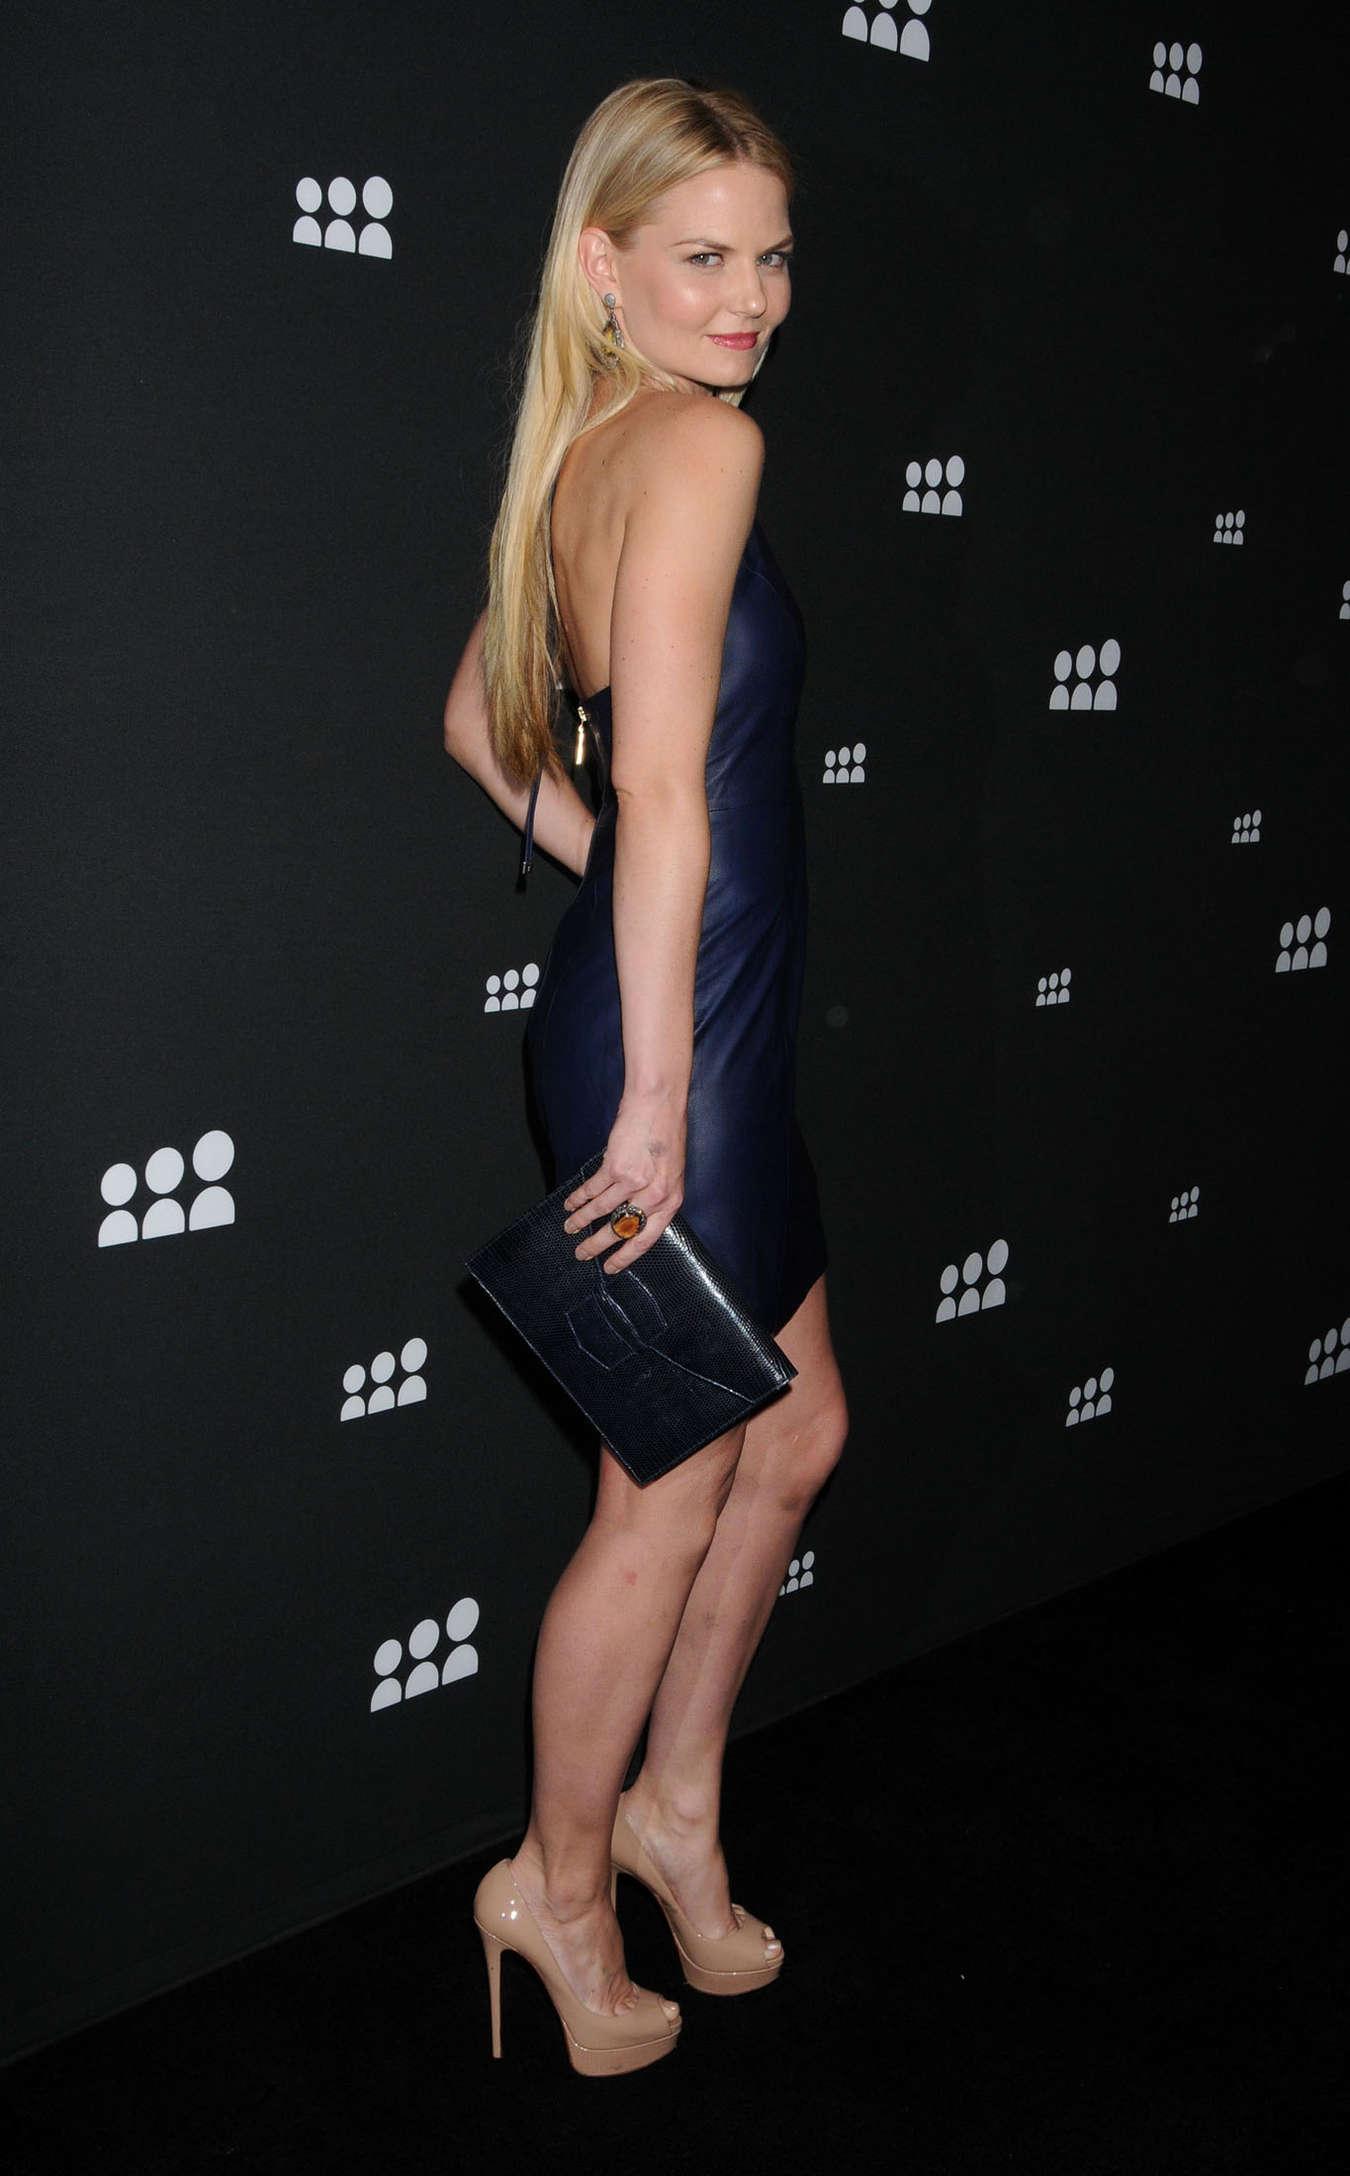 Taxi New York >> Jennifer Morrison Hot in tight dress at 2013 Myspace Event -08 | GotCeleb